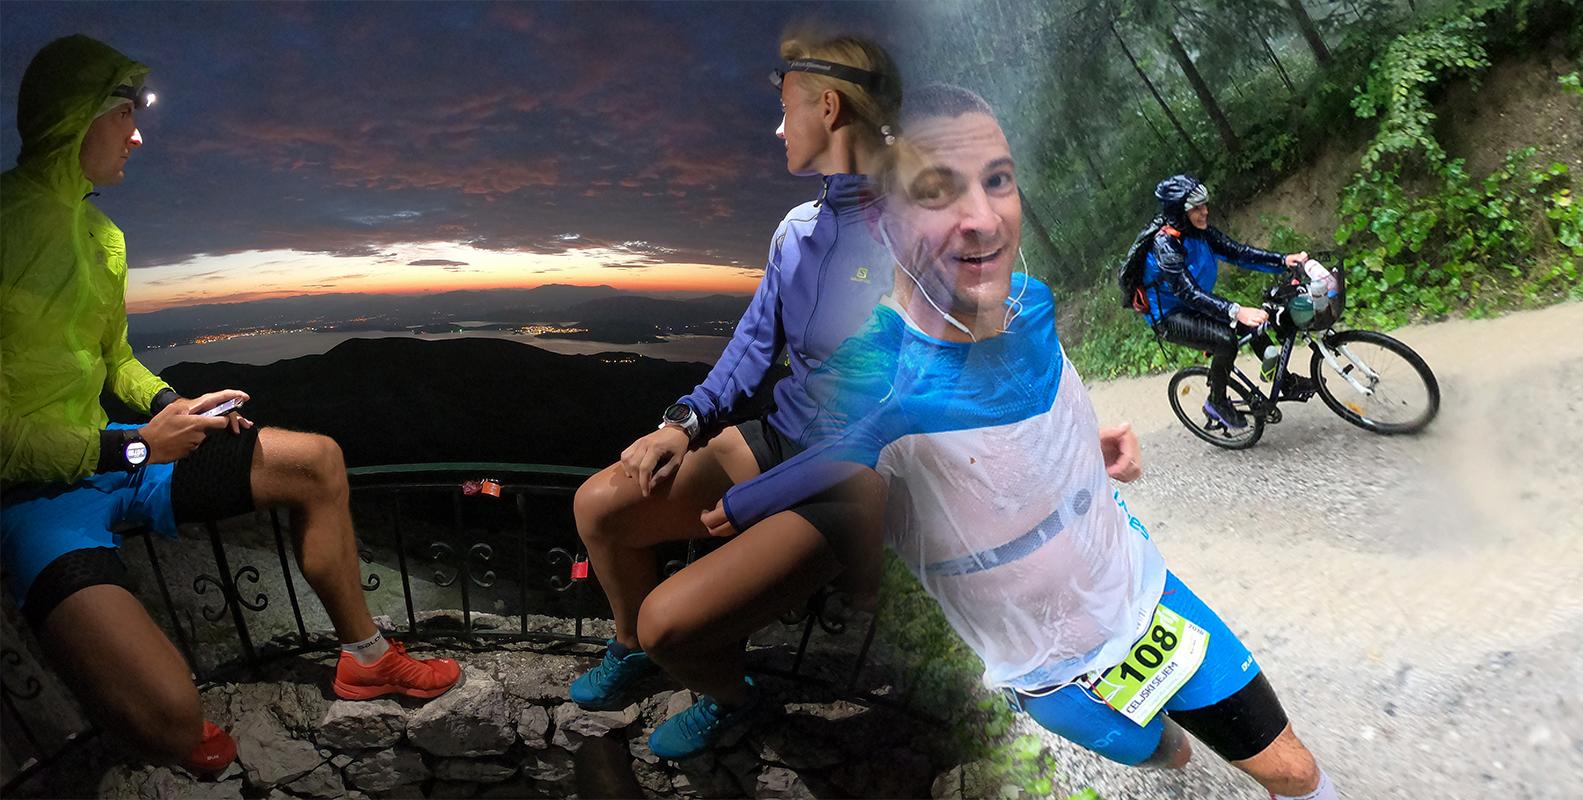 MyGreece&UltramaratonLogarskaDolina